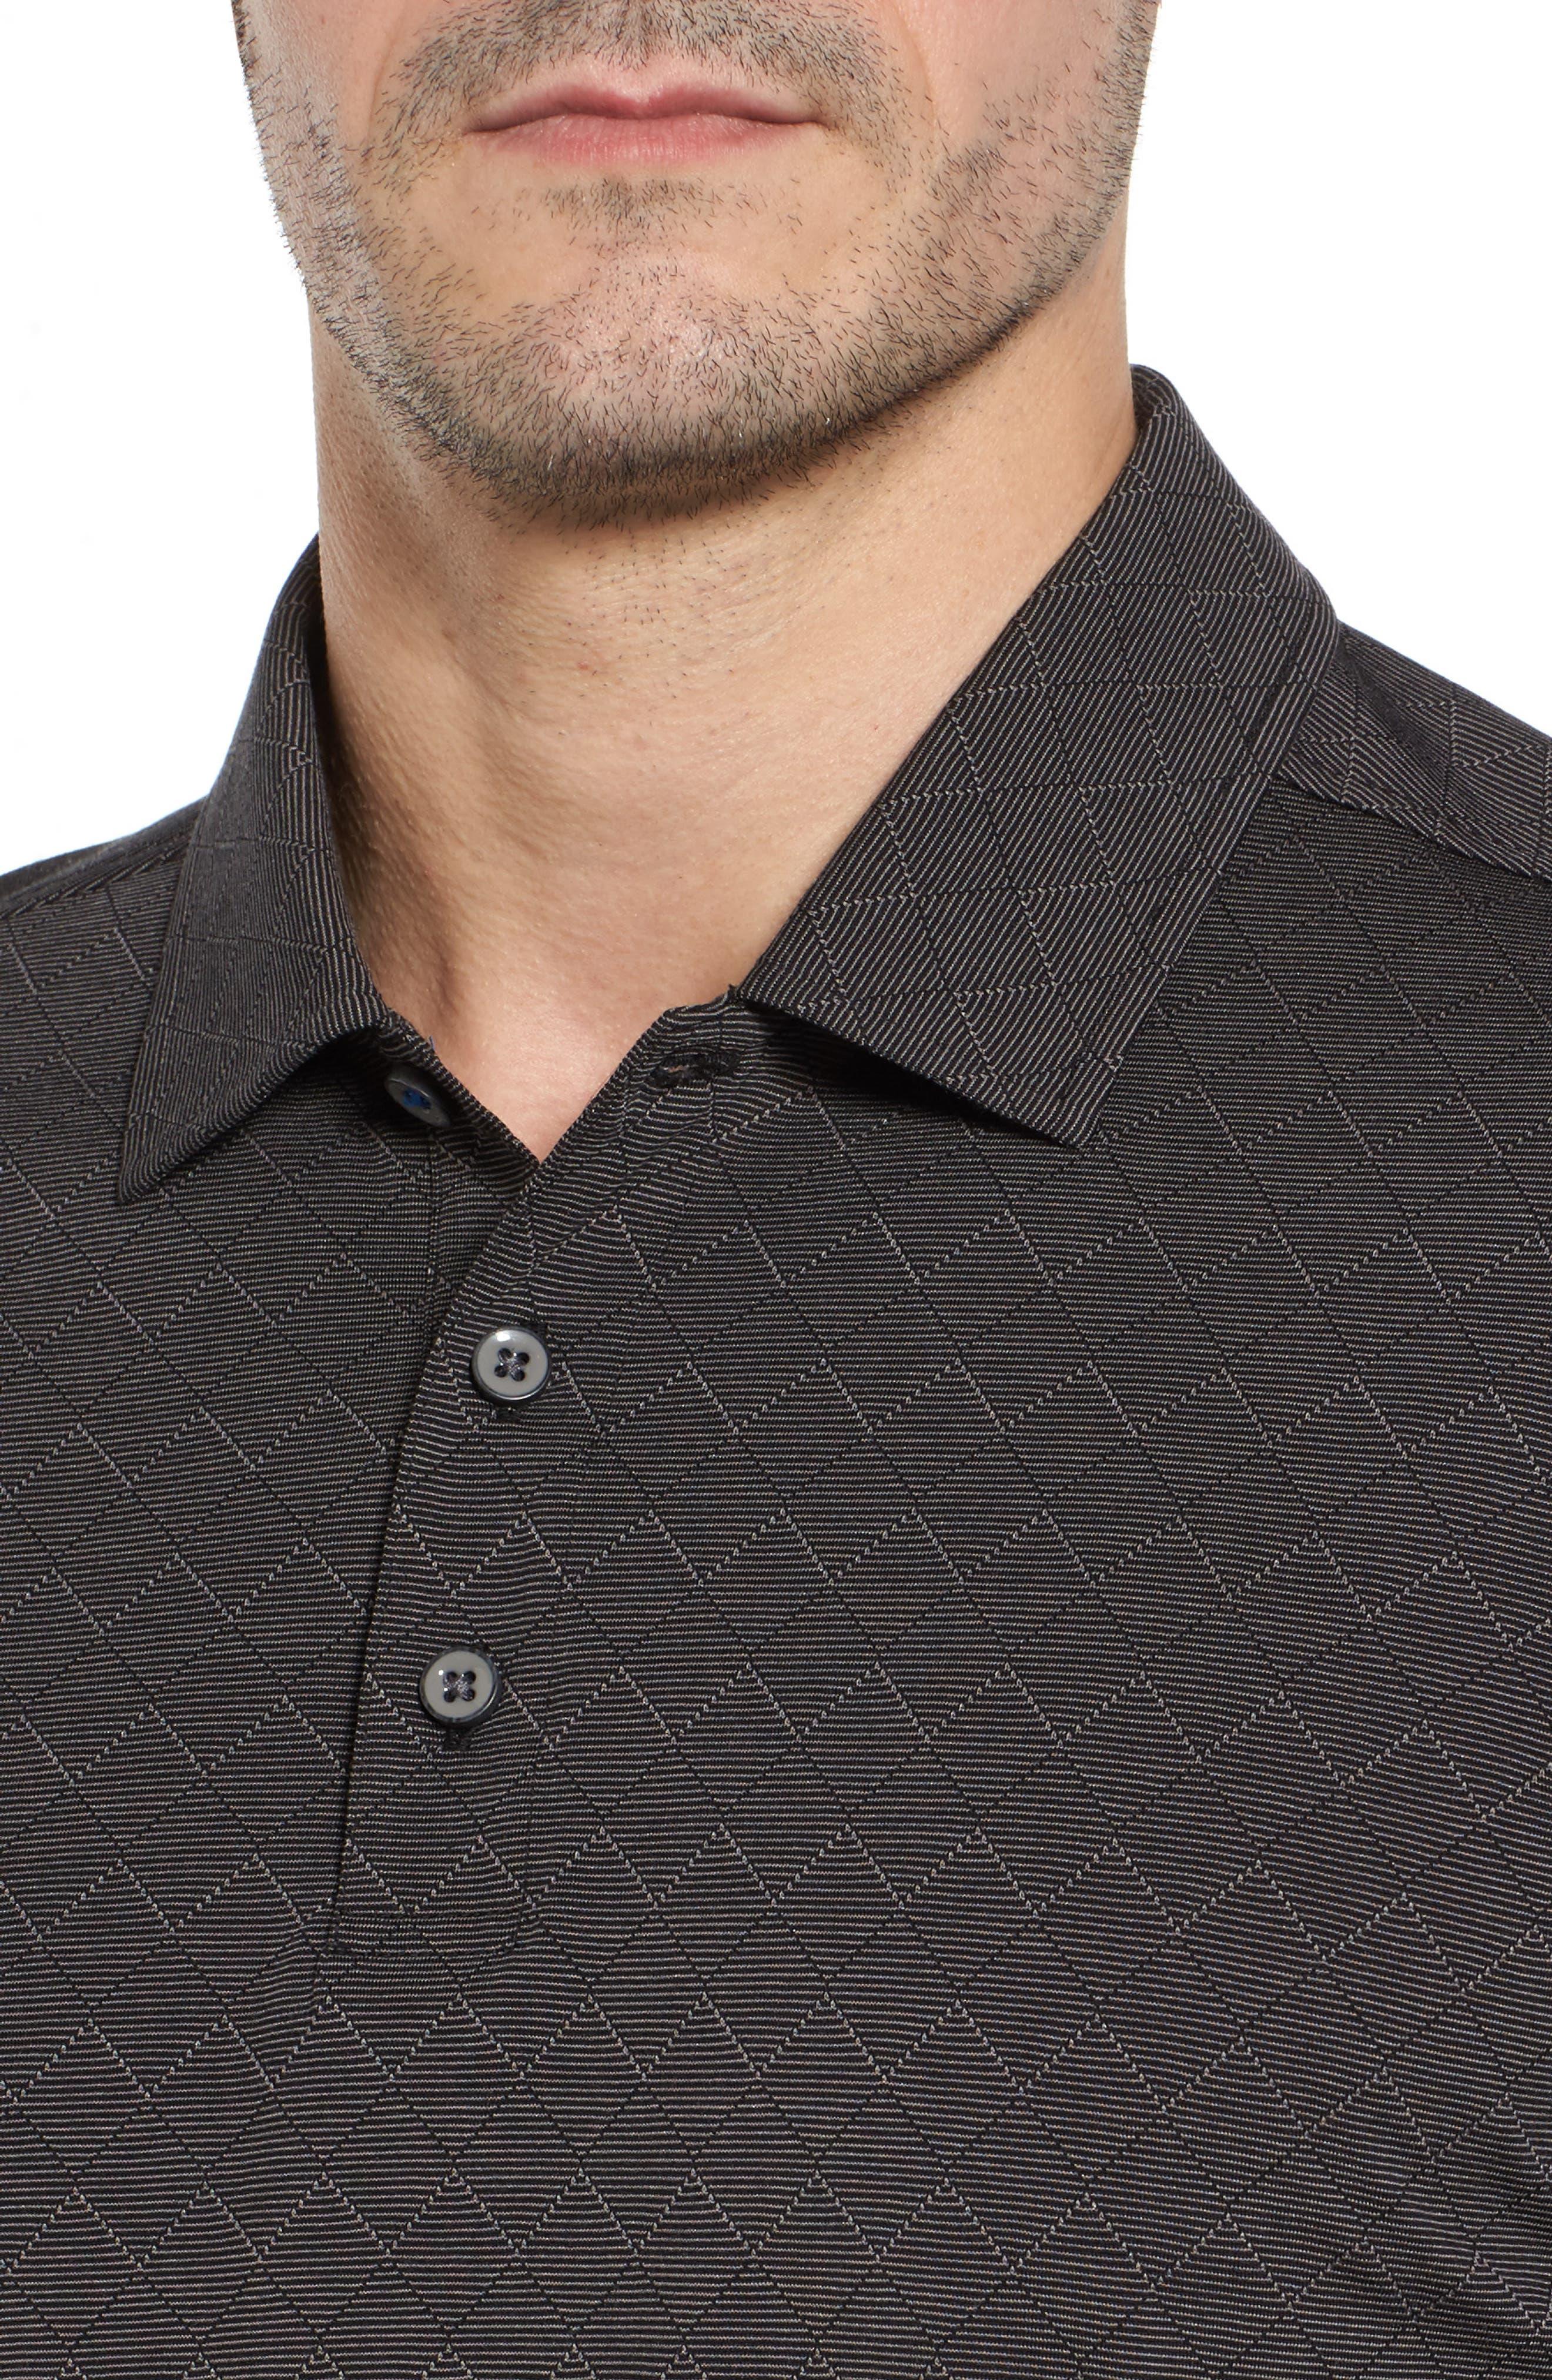 Diamond Drift Spectator Polo Shirt,                             Alternate thumbnail 4, color,                             001